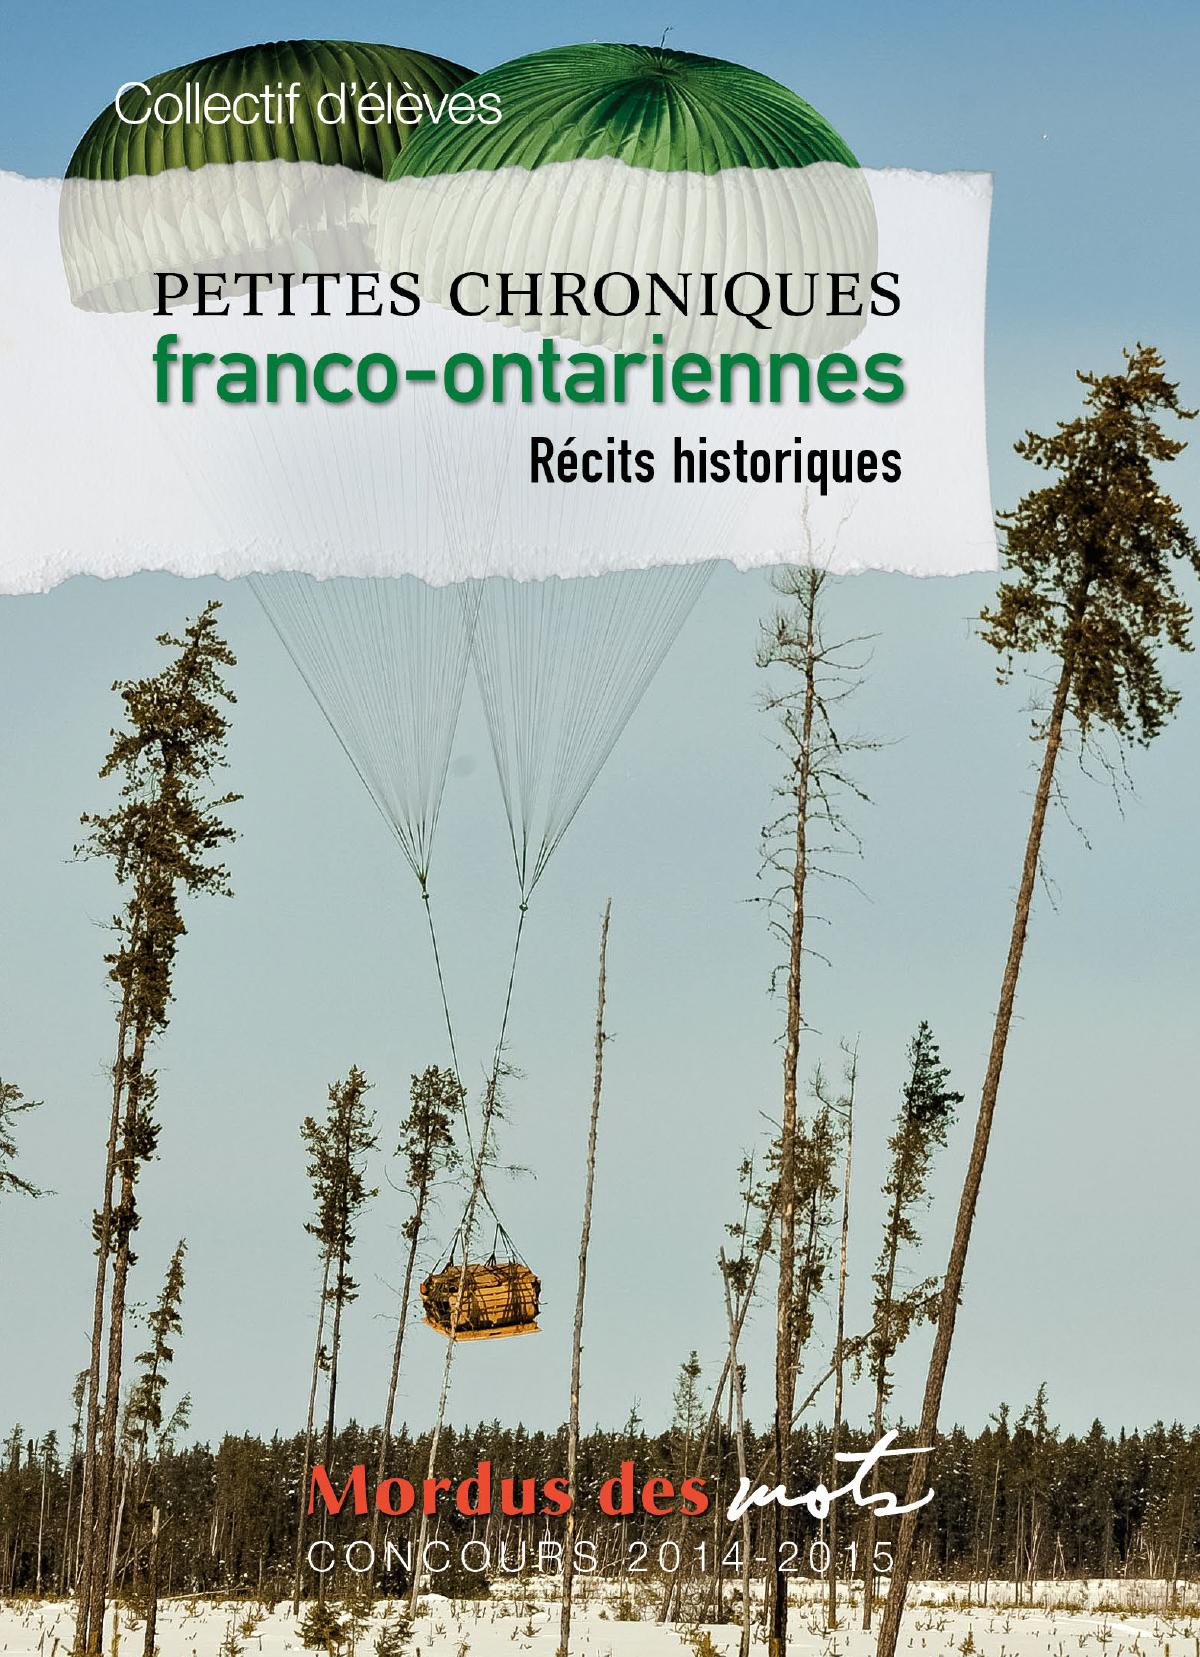 Petites chroniques franco-ontariennes